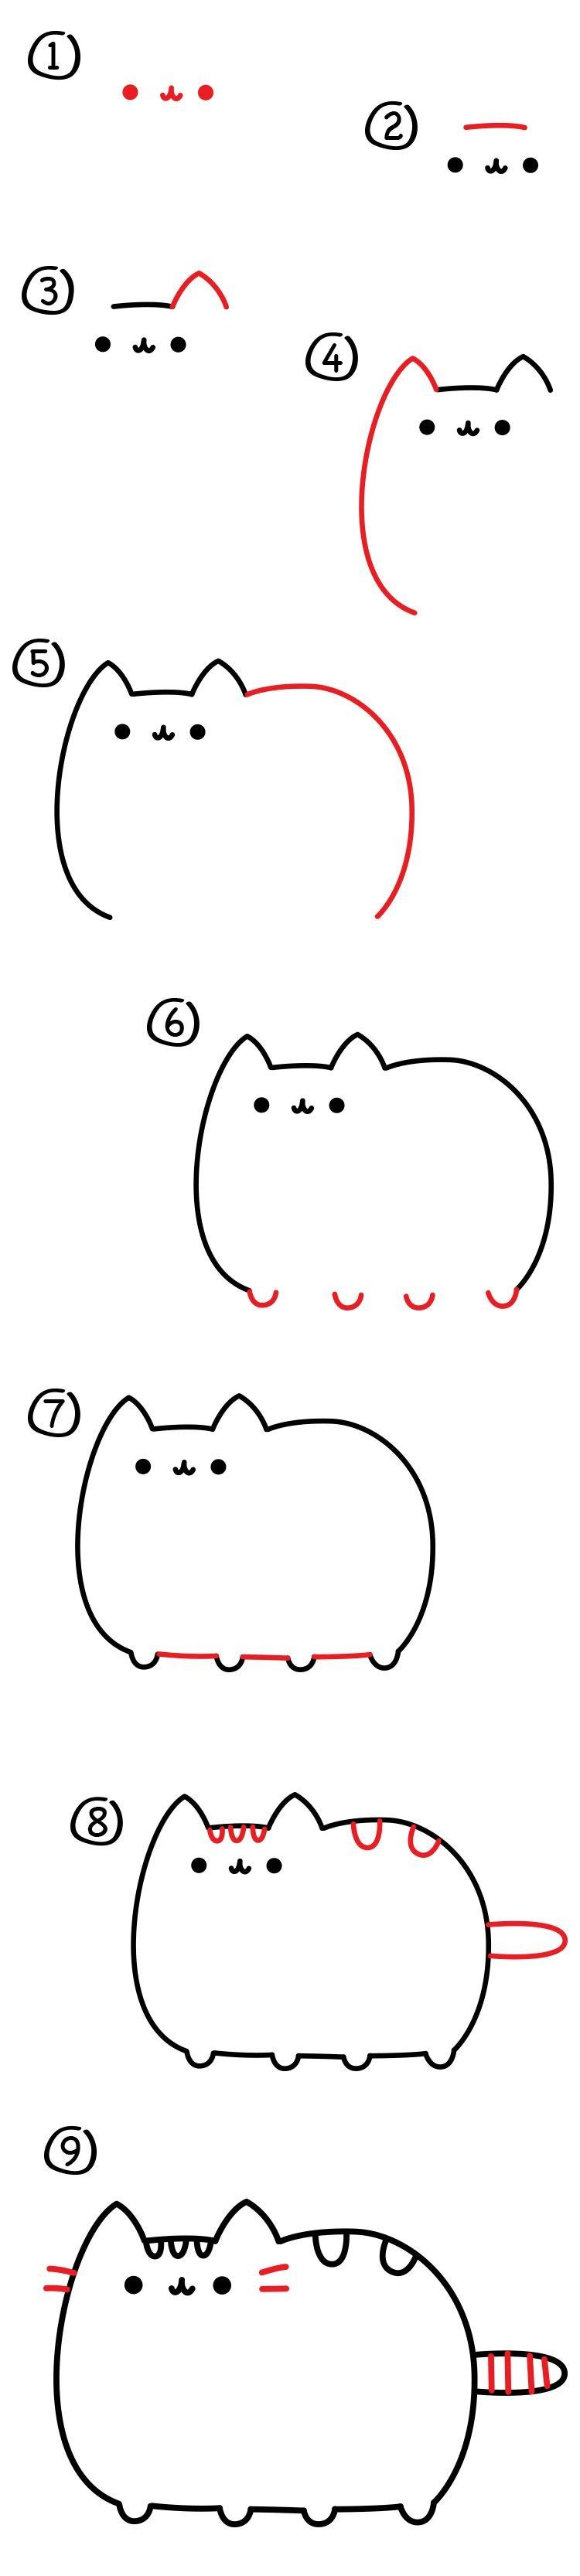 Como Dibujar Un Dibujo Kawaii Paso A Paso